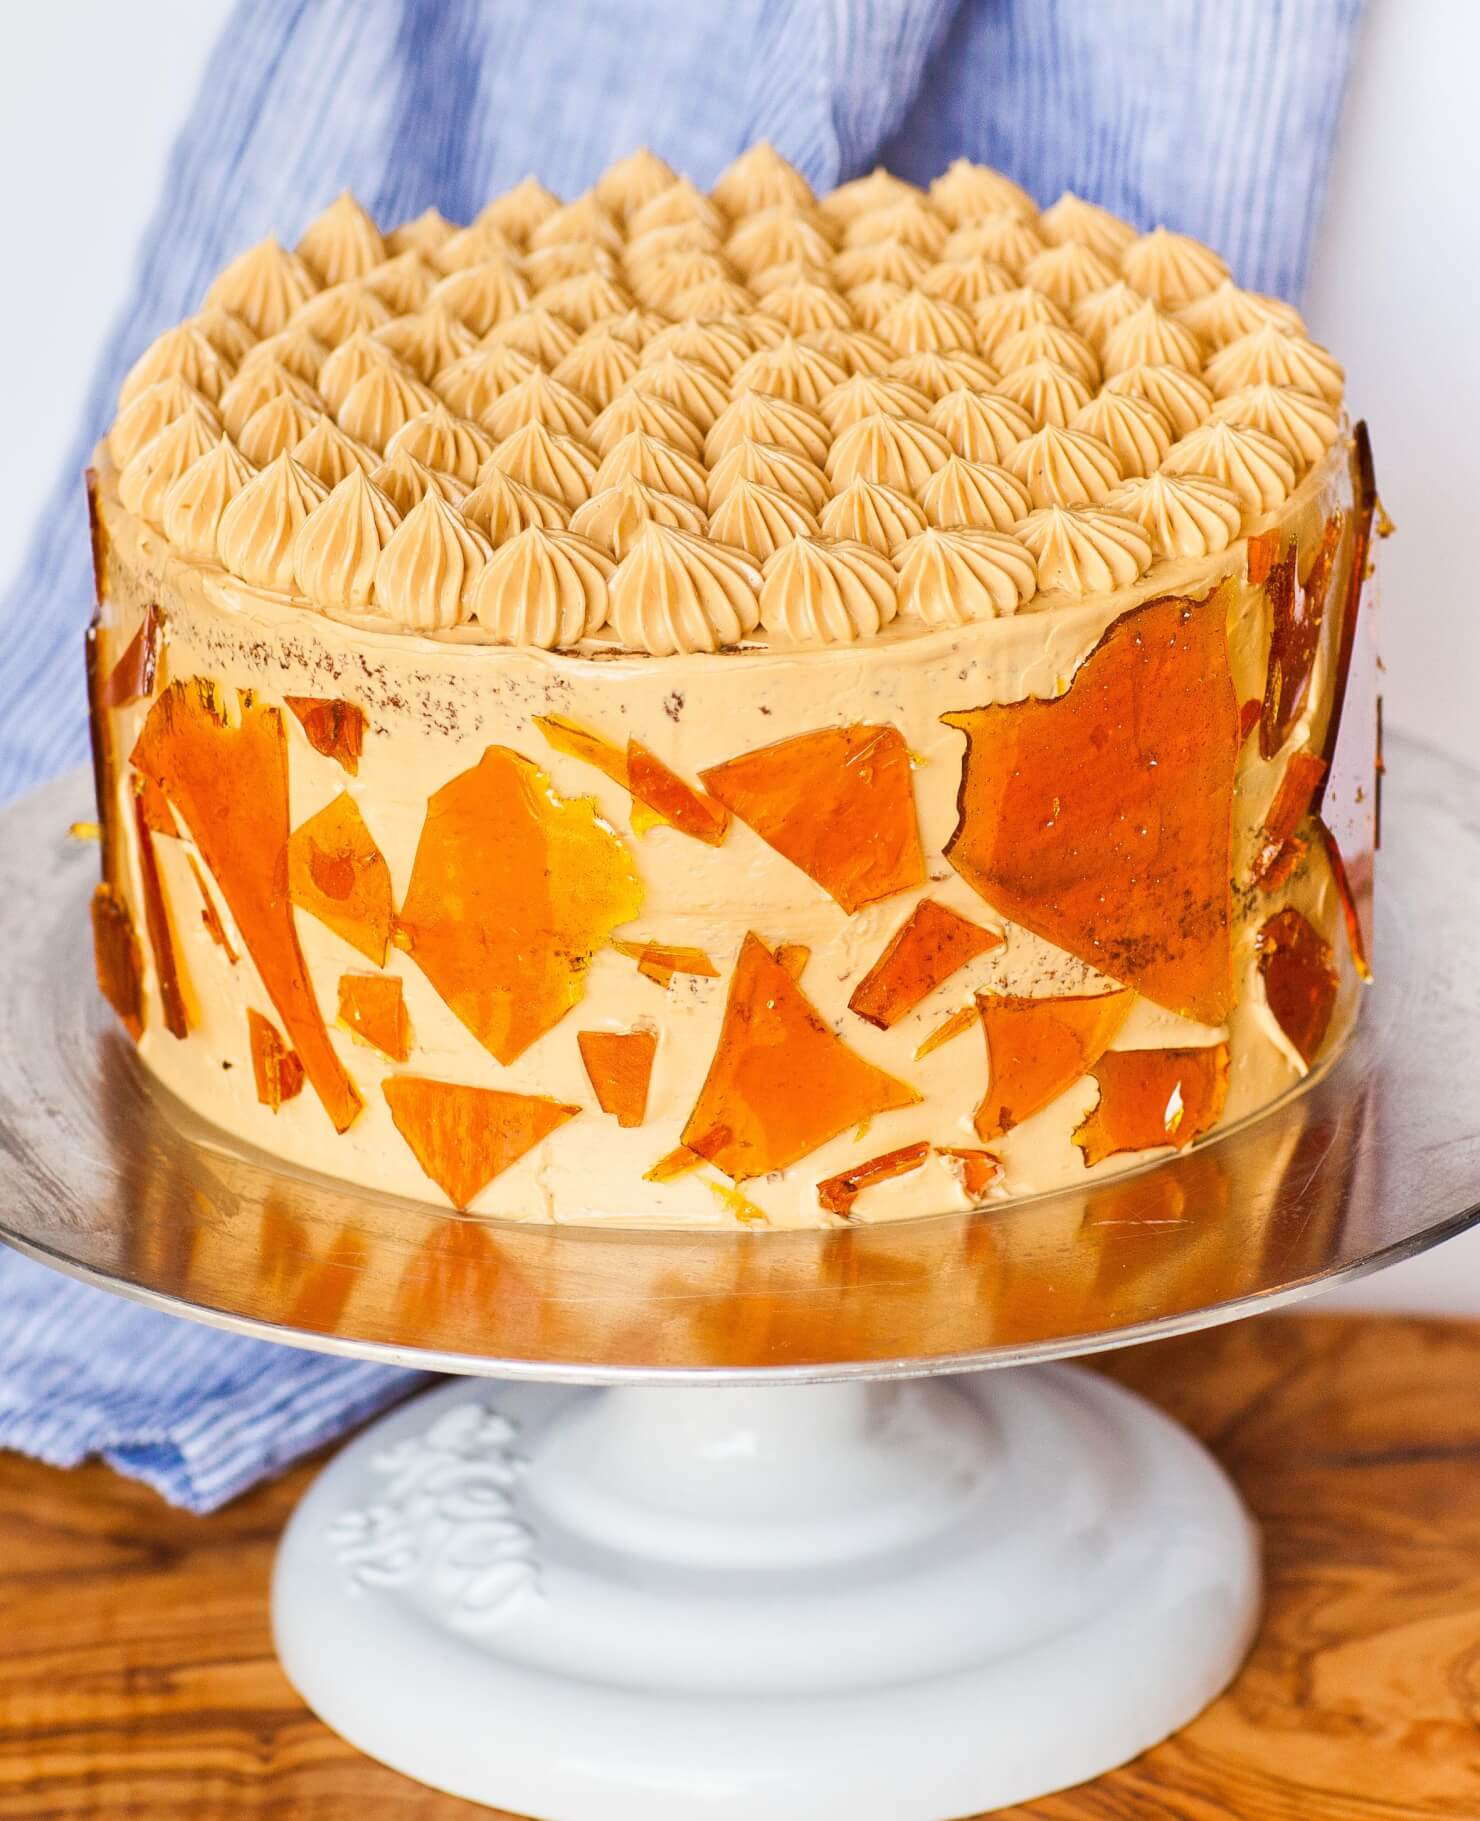 decorated dulce de leche cake